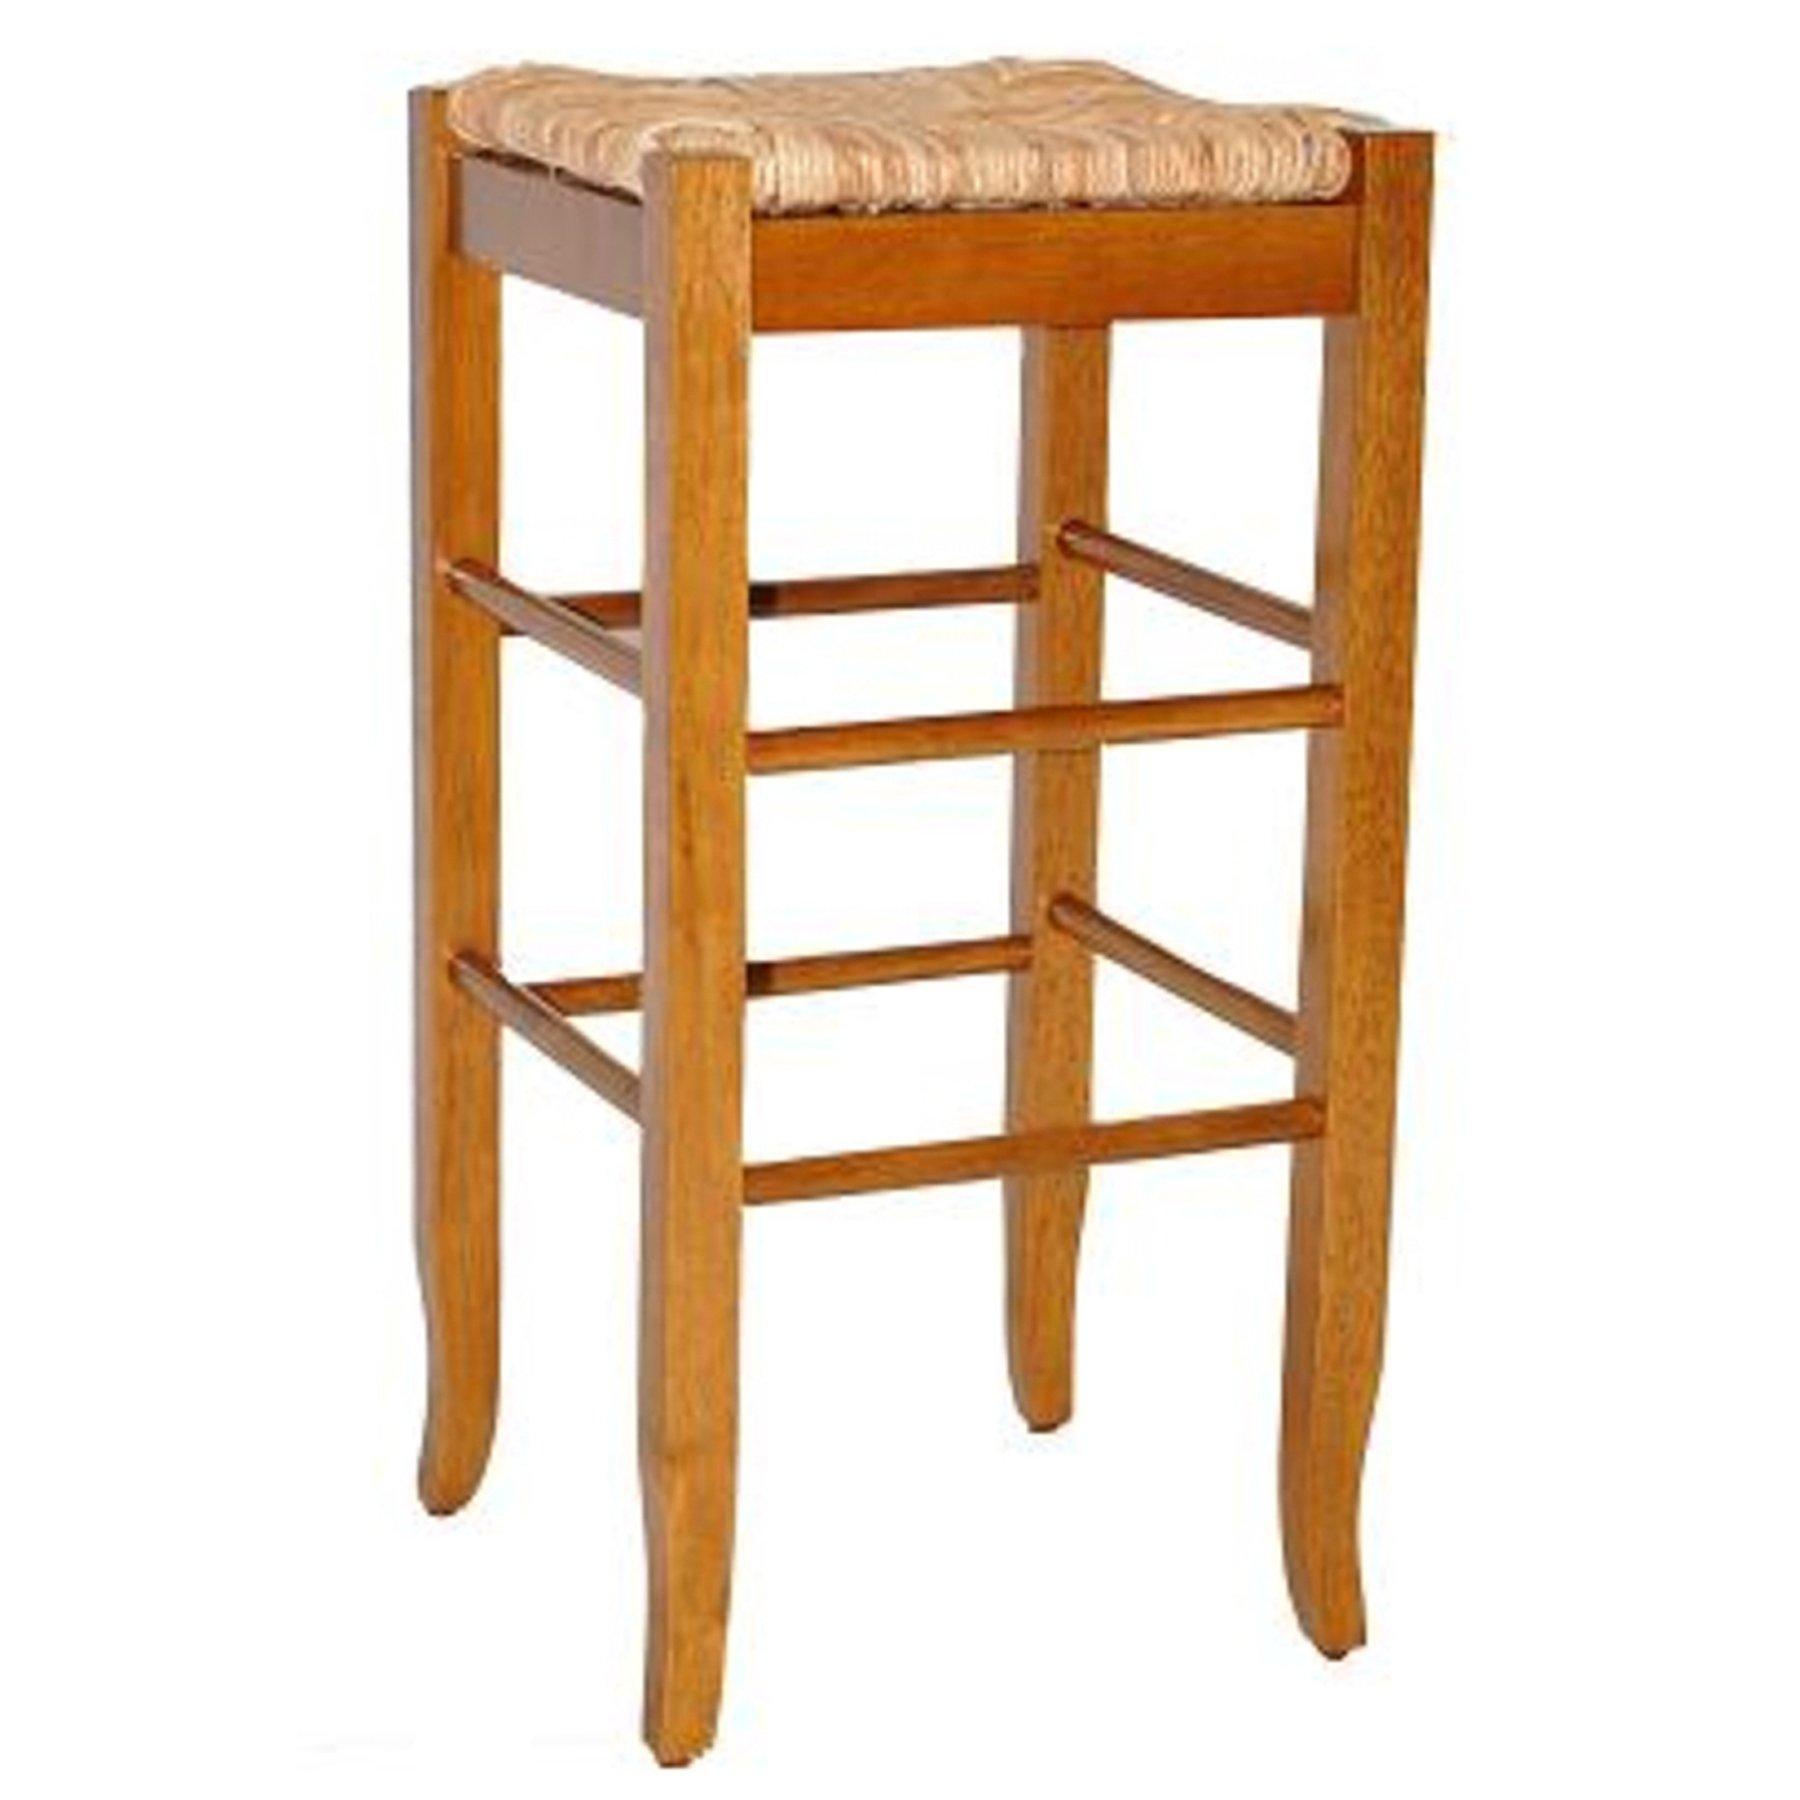 Boraam 94129 Square Rush Seat Bar Height Stool, 29-Inch, Oak